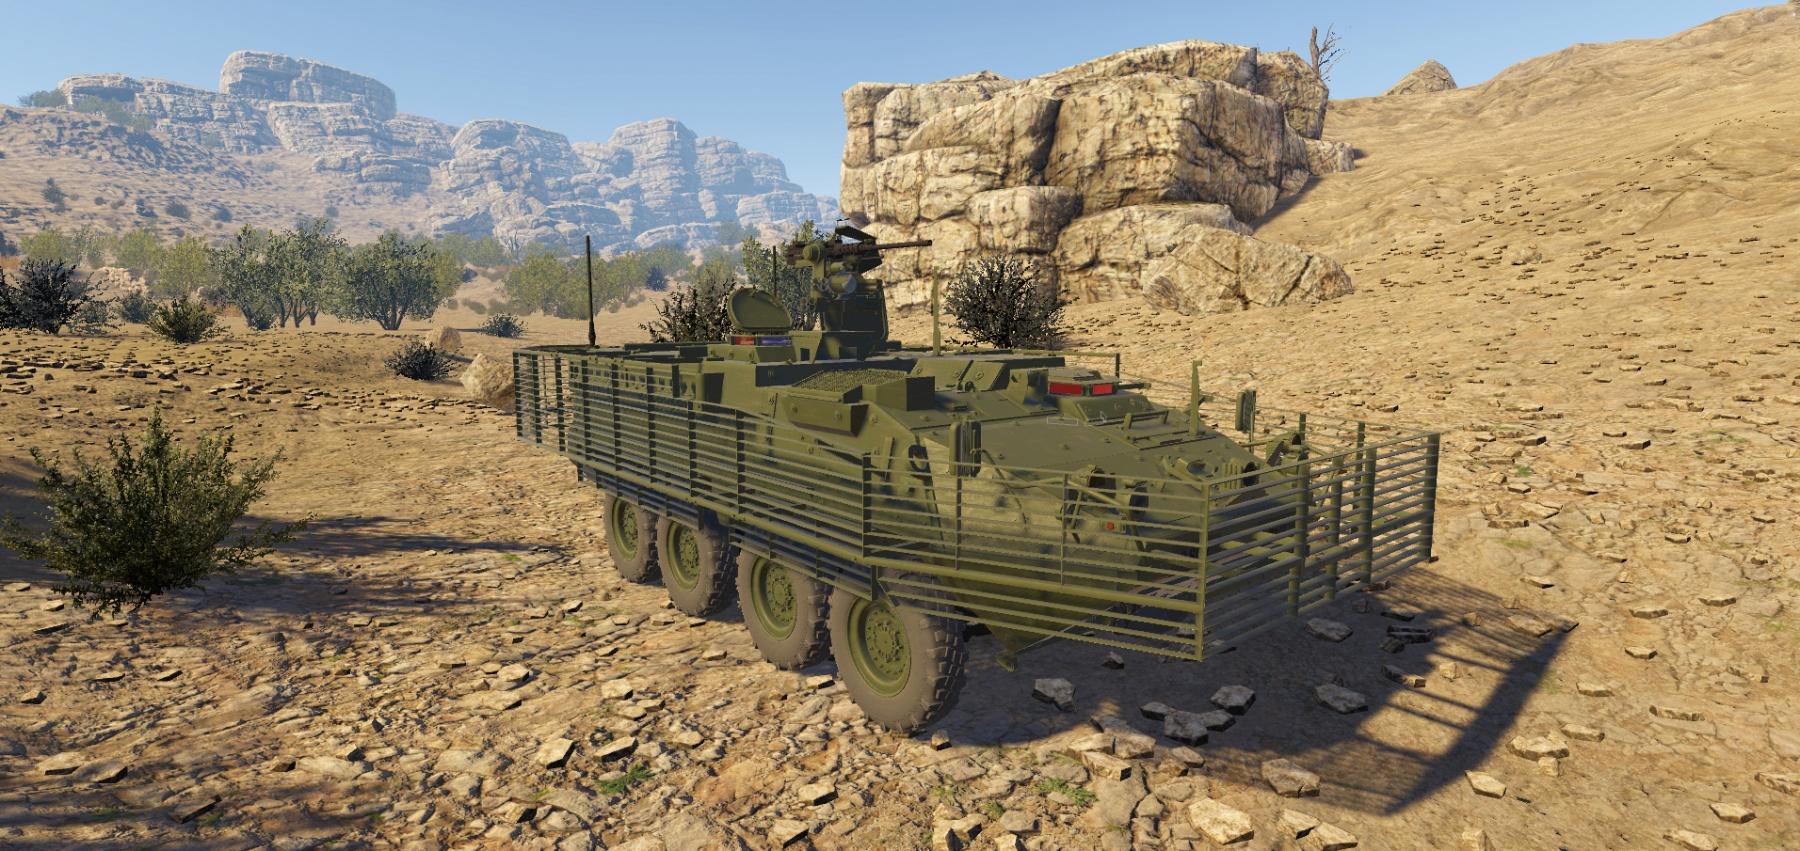 A tank in the desert shown in Virtual Reality using Xplorer